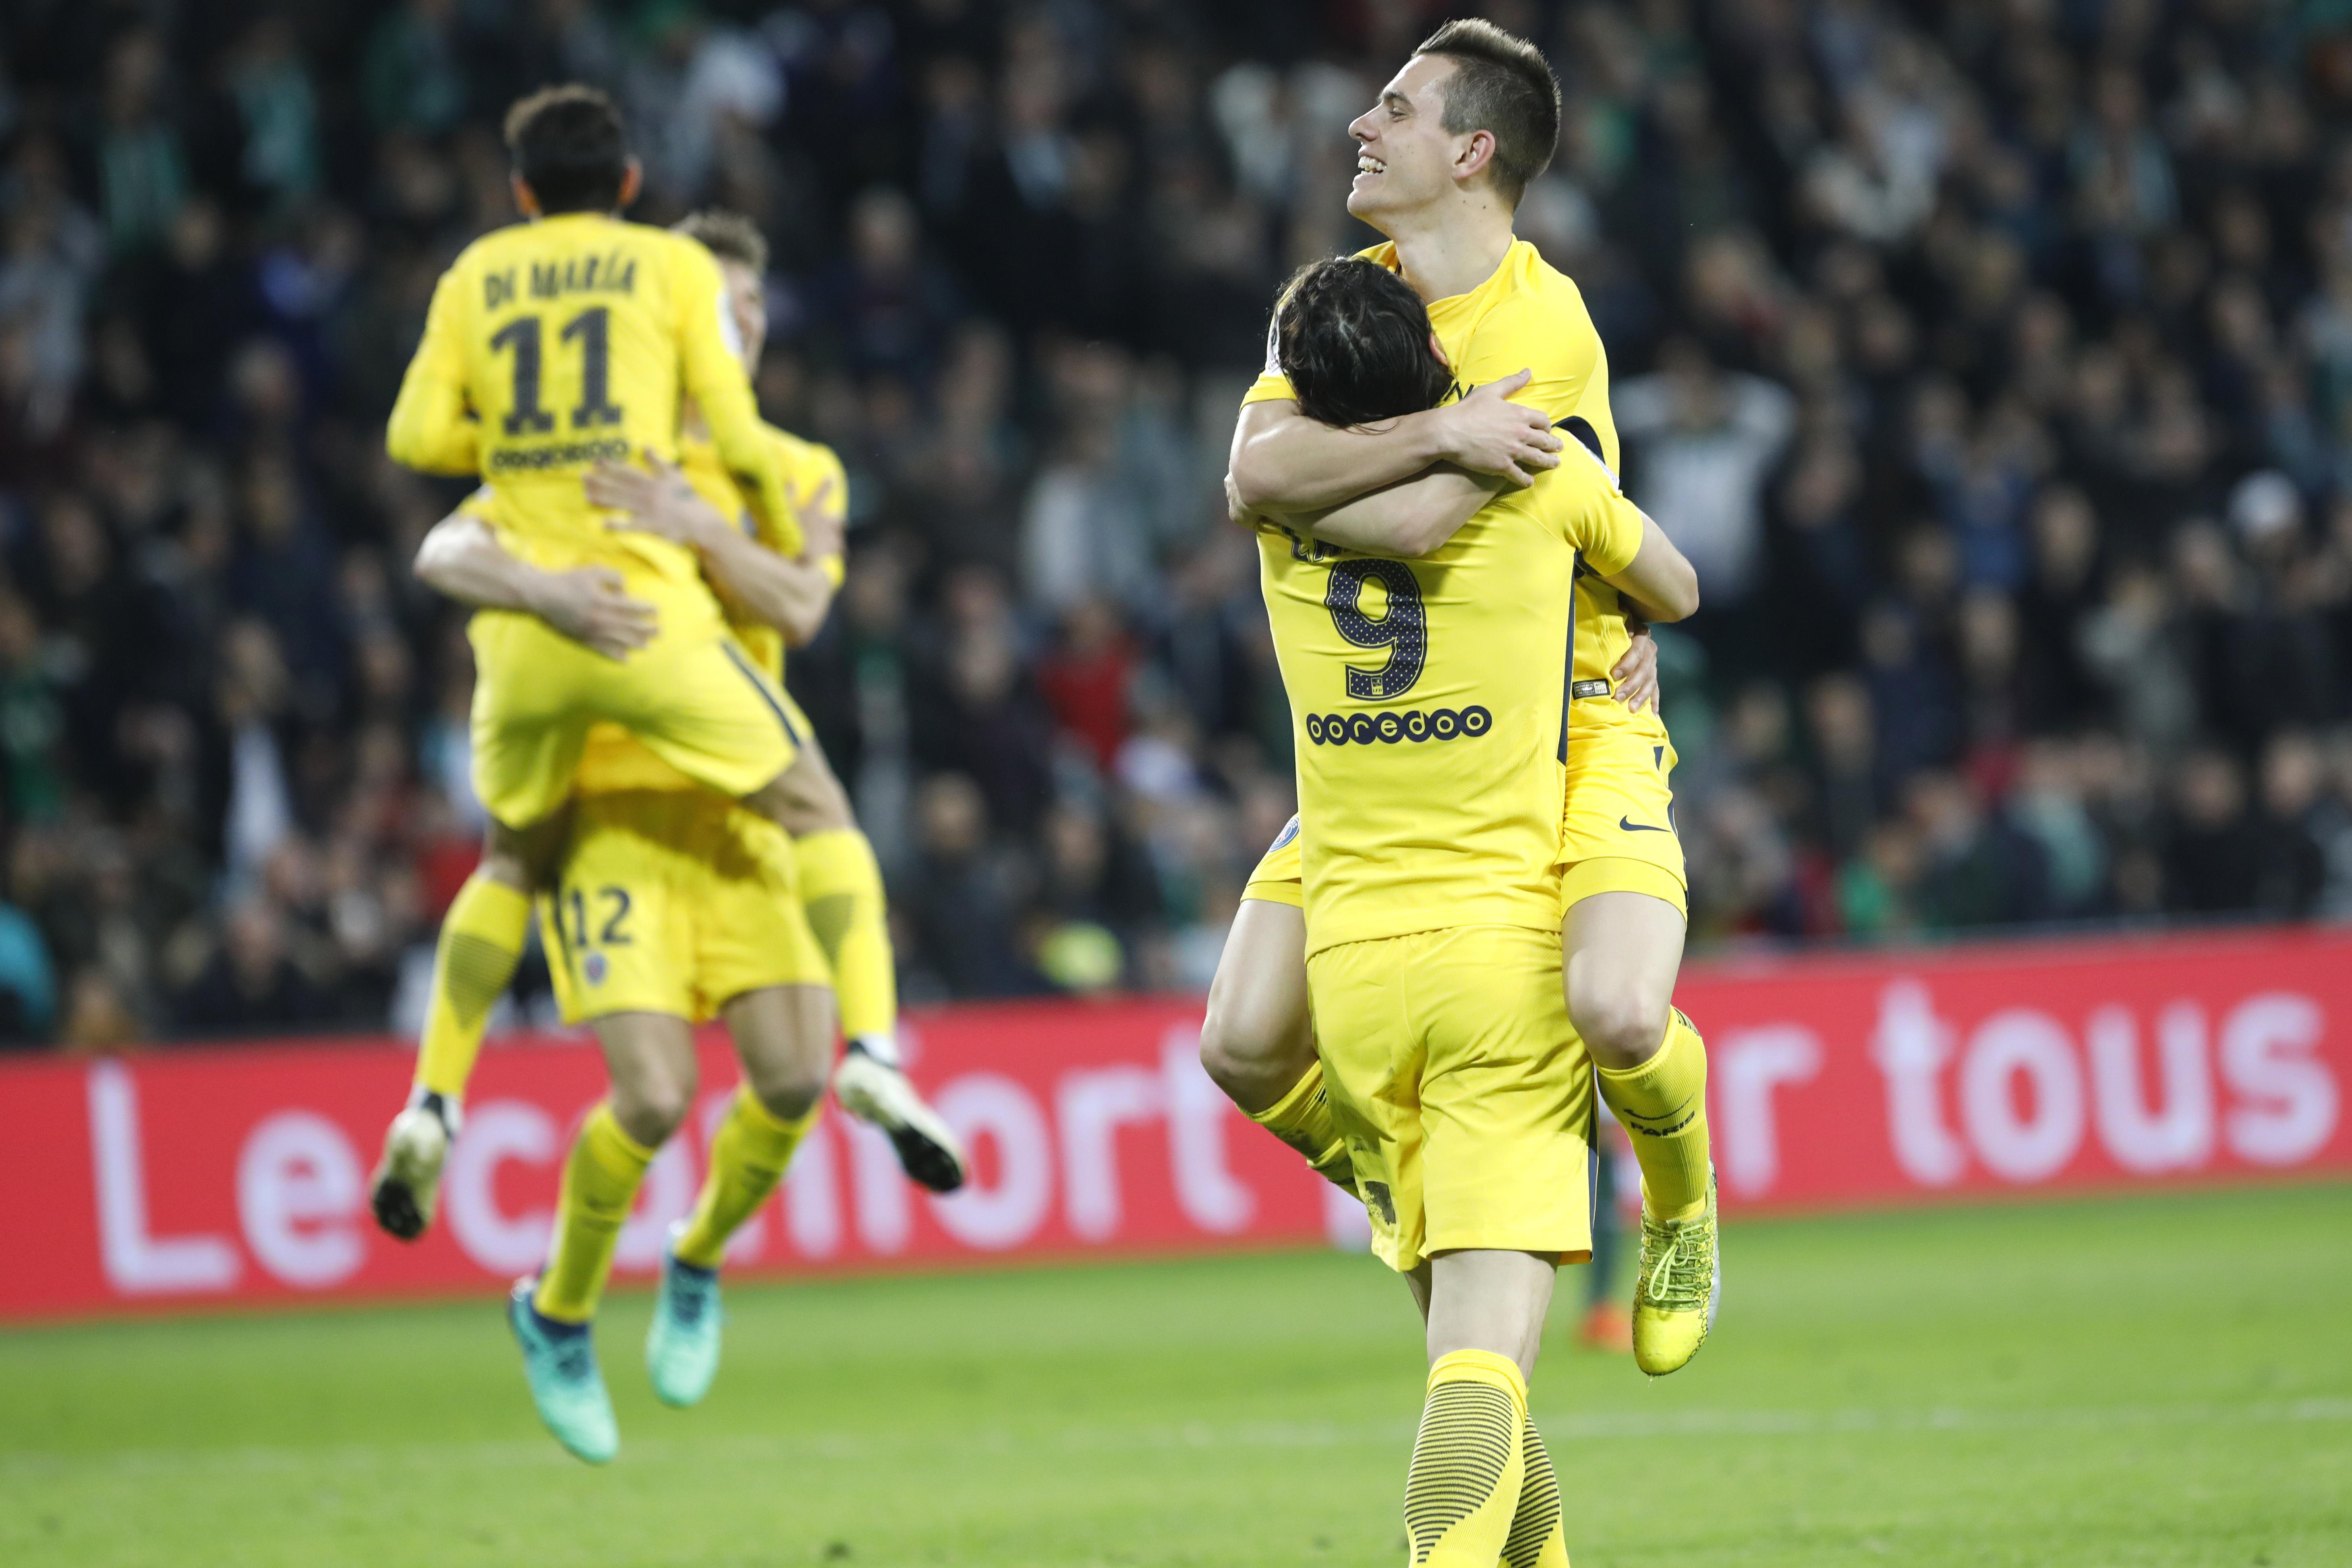 PSG fullback Thomas Meunier keen to hear from 'Everton, Valencia or Dortmund'